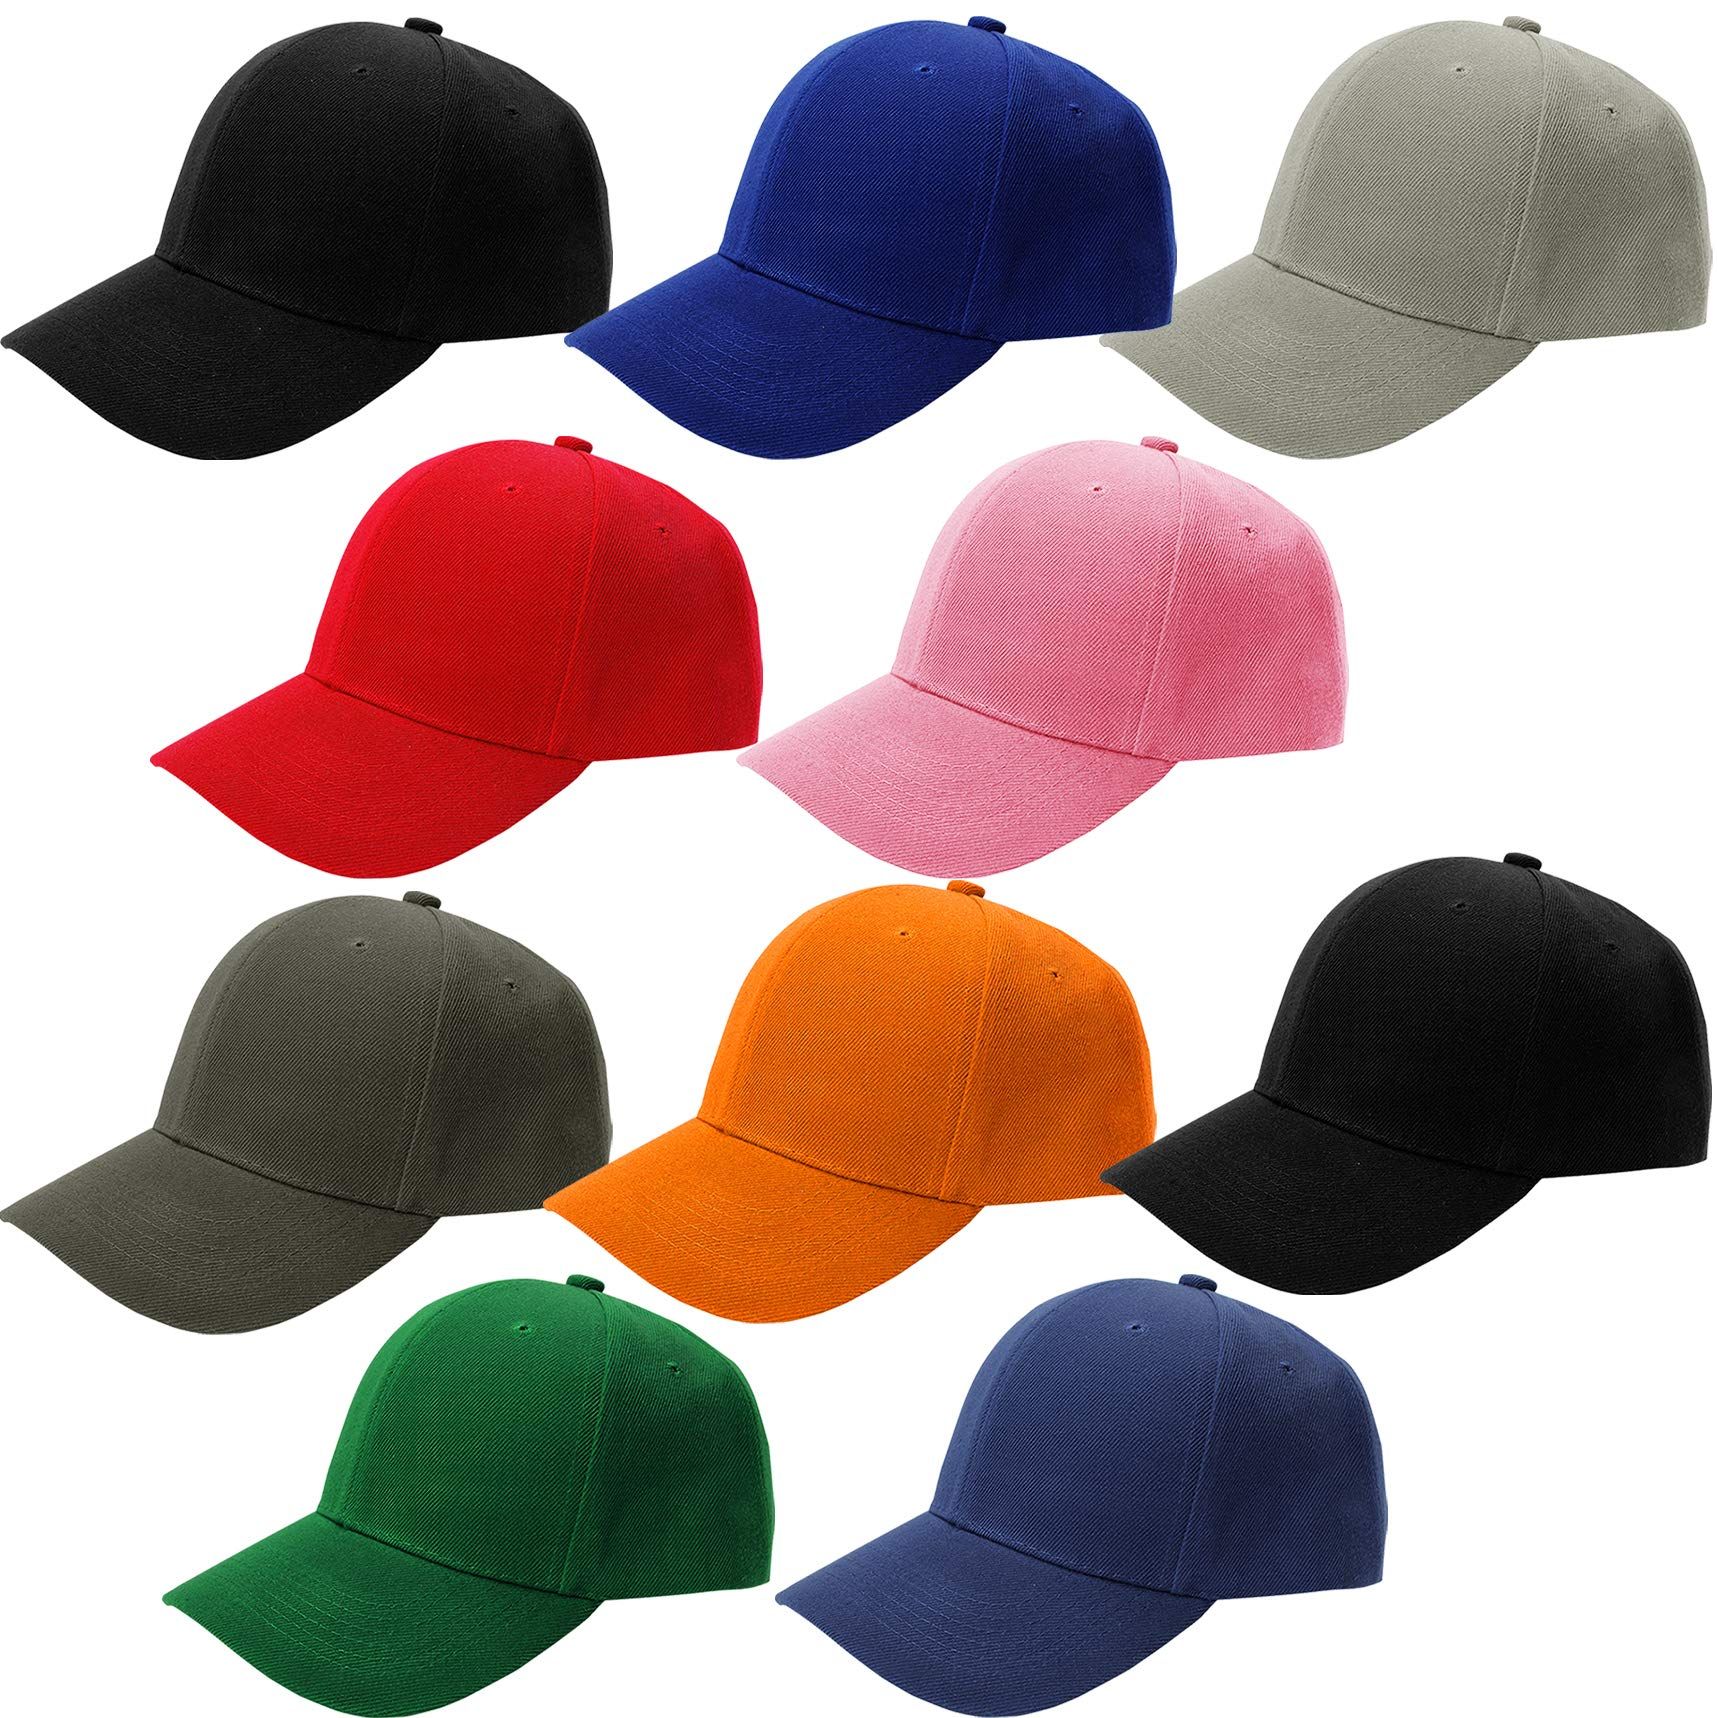 CoverYourHair Baseball Hats - Plain Dad Hat - Baseball Caps - Adjustable Sport Cap ,10 Pack Baseball Cap, Multi color,One Size